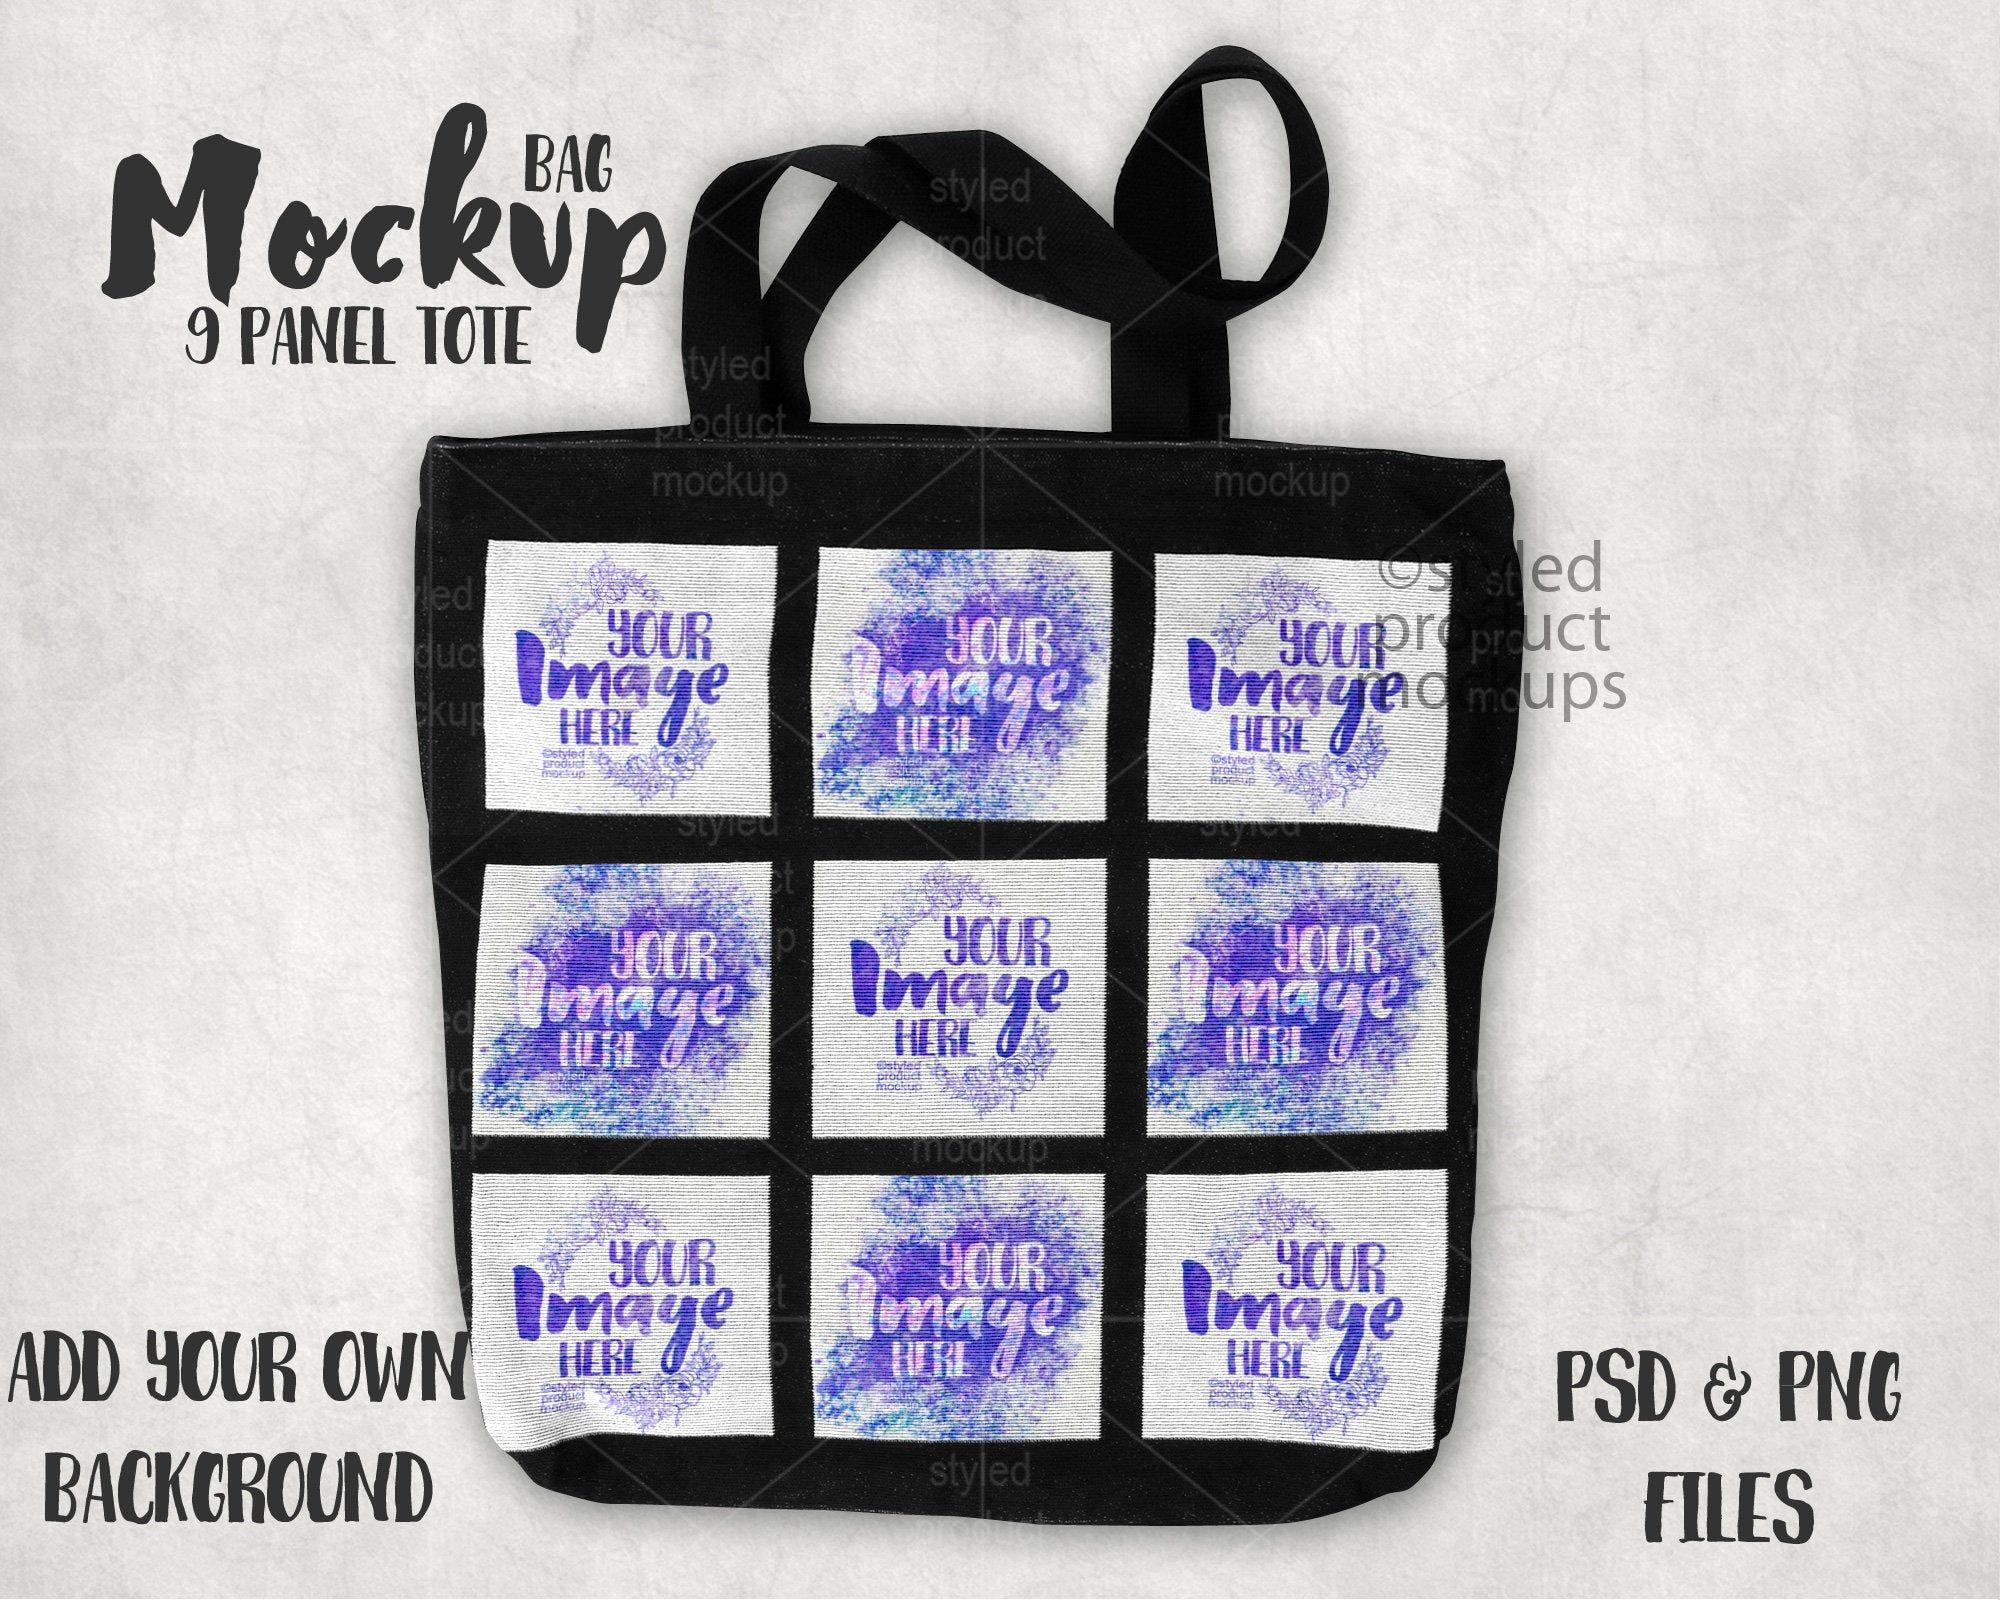 Download Dye Sublimation 9 Panel Tote Bag Mockup Add Your Own Image Etsy Bag Mockup Tote Tote Bag